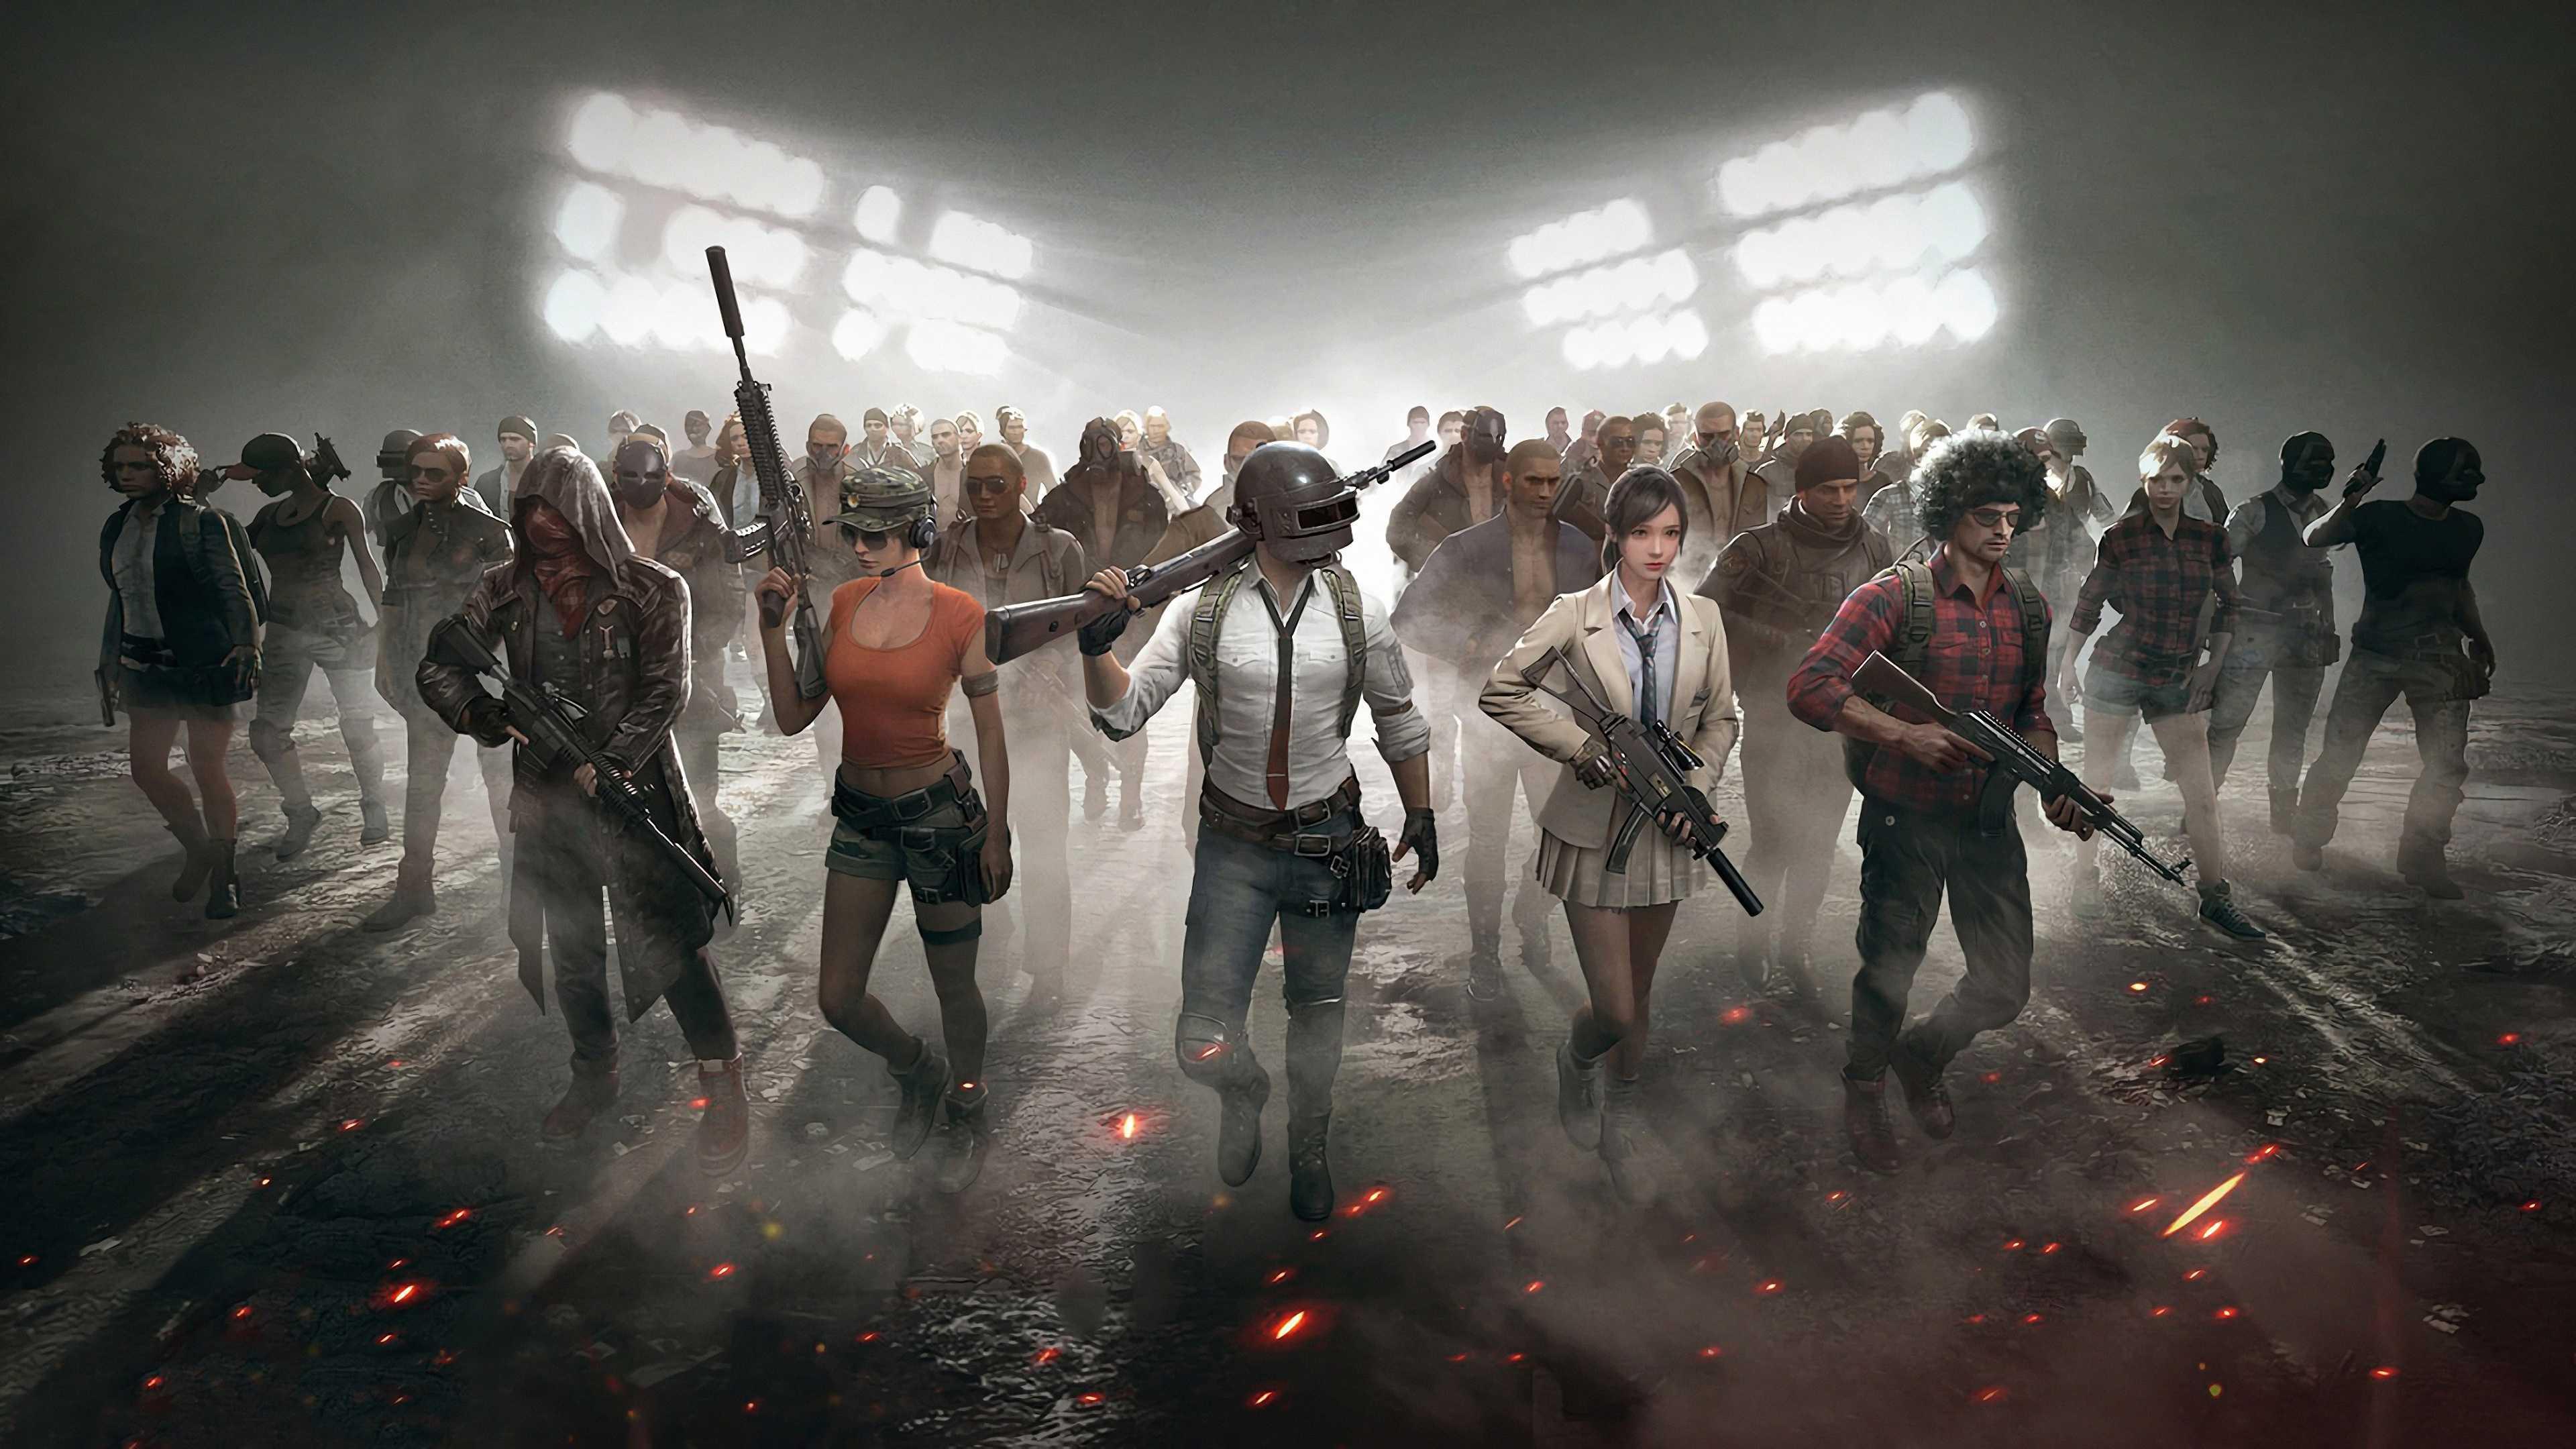 All Team Playerunknown's Battlegrounds